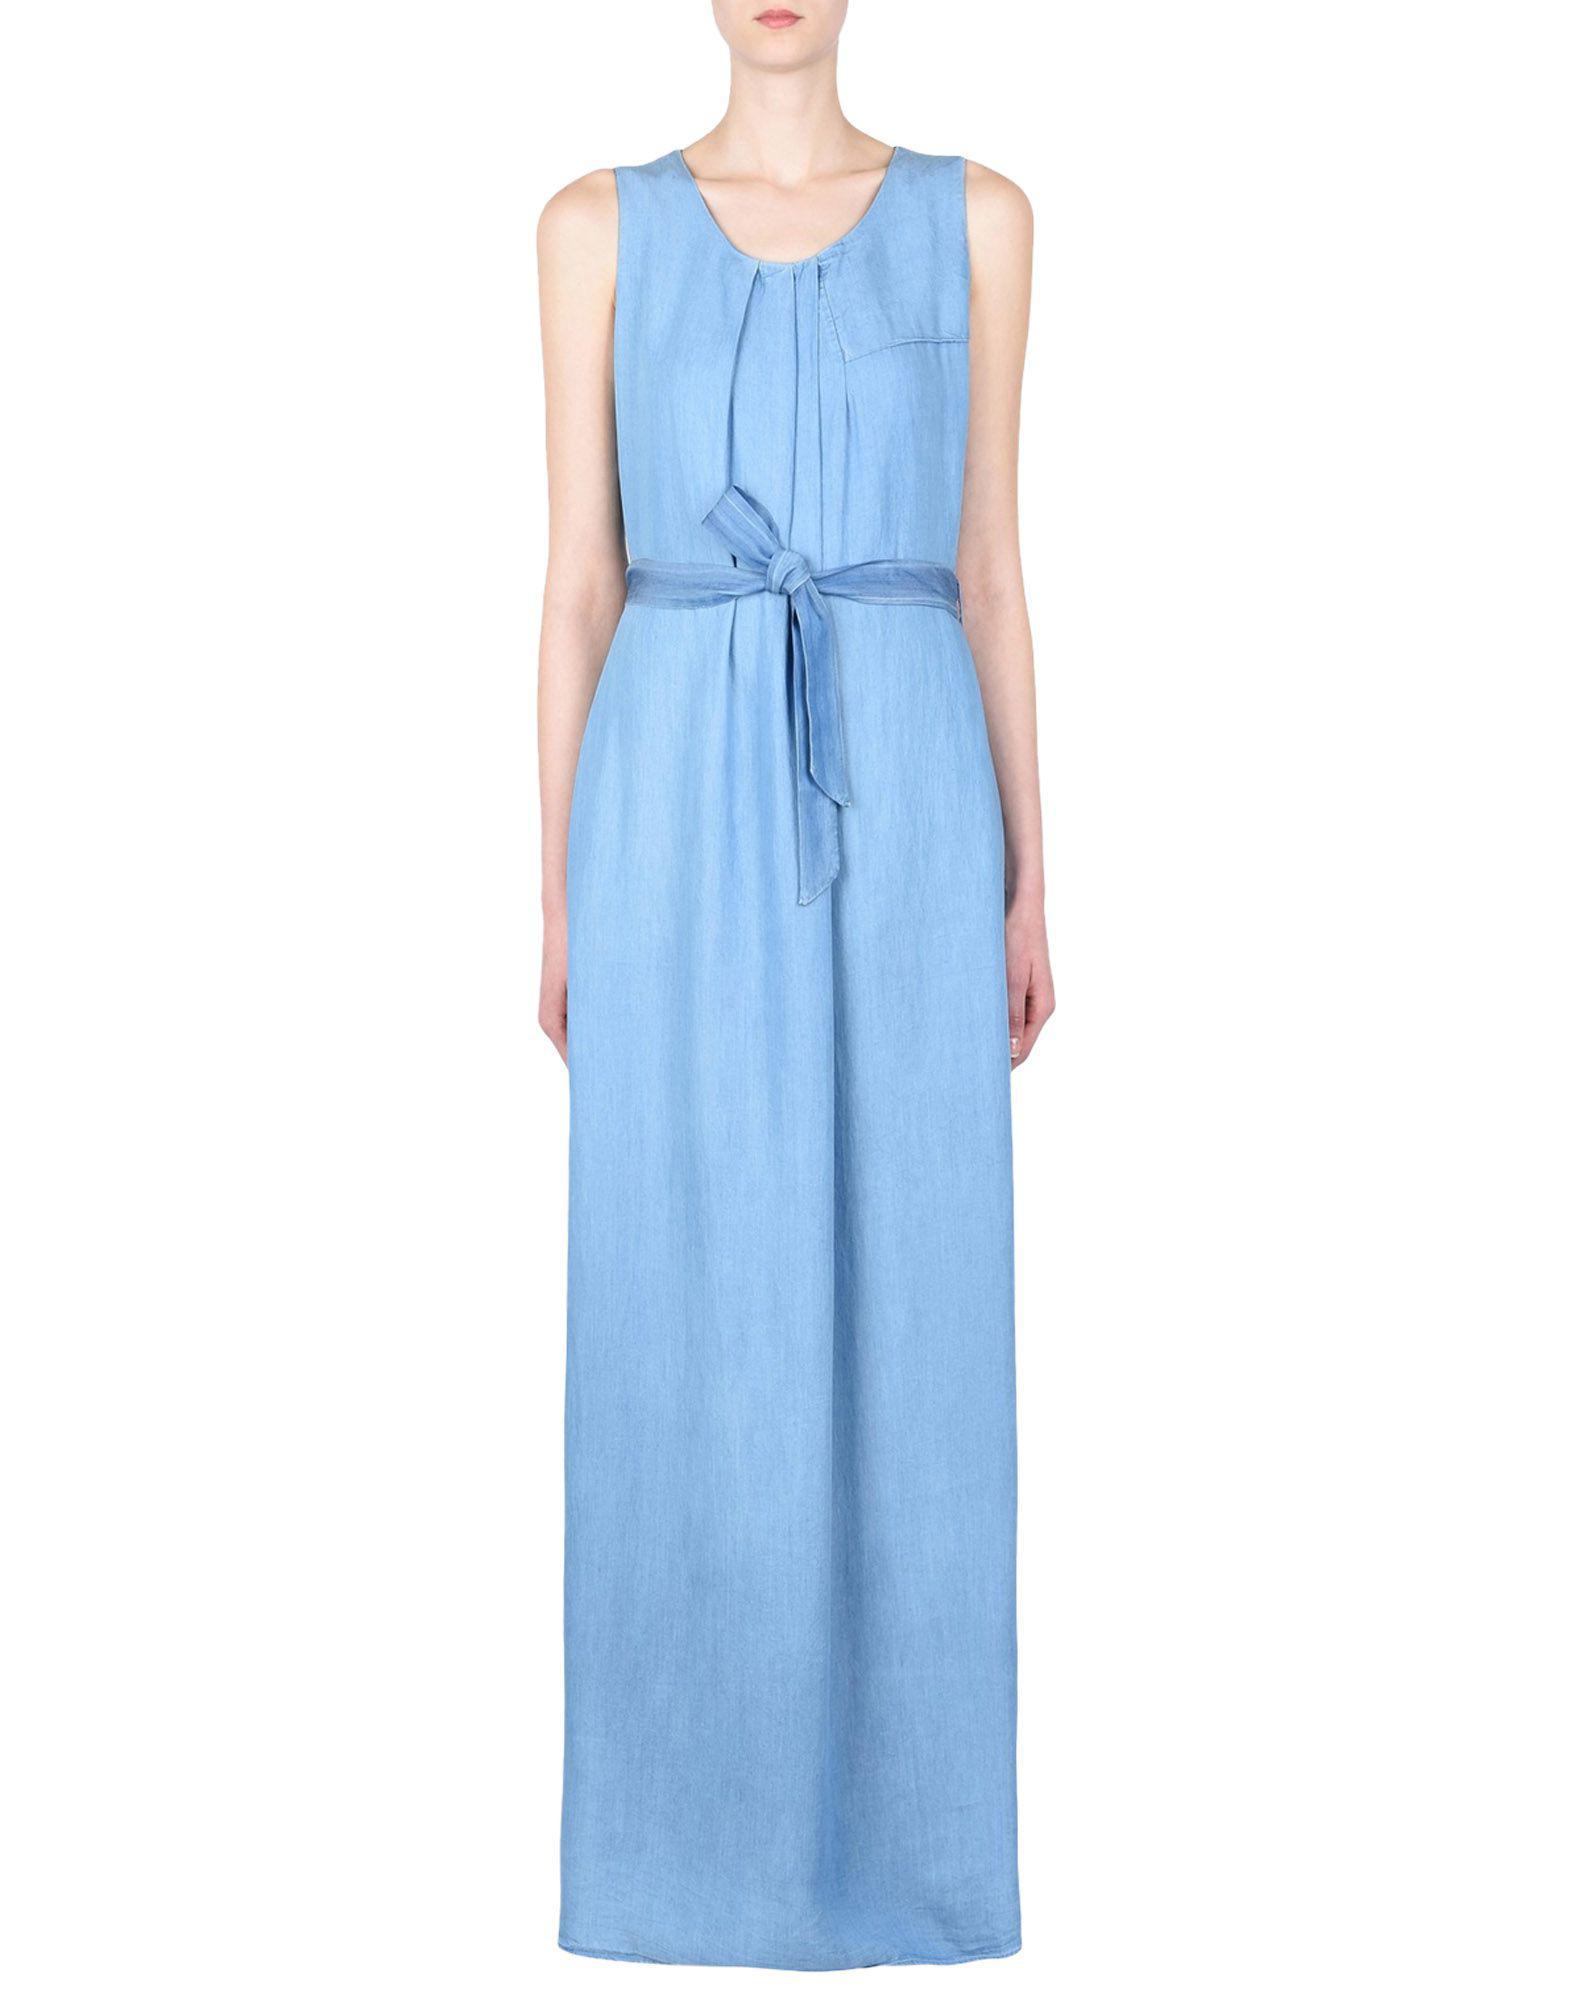 fdd89194edf Lyst - Robe longue Armani Jeans en coloris Bleu